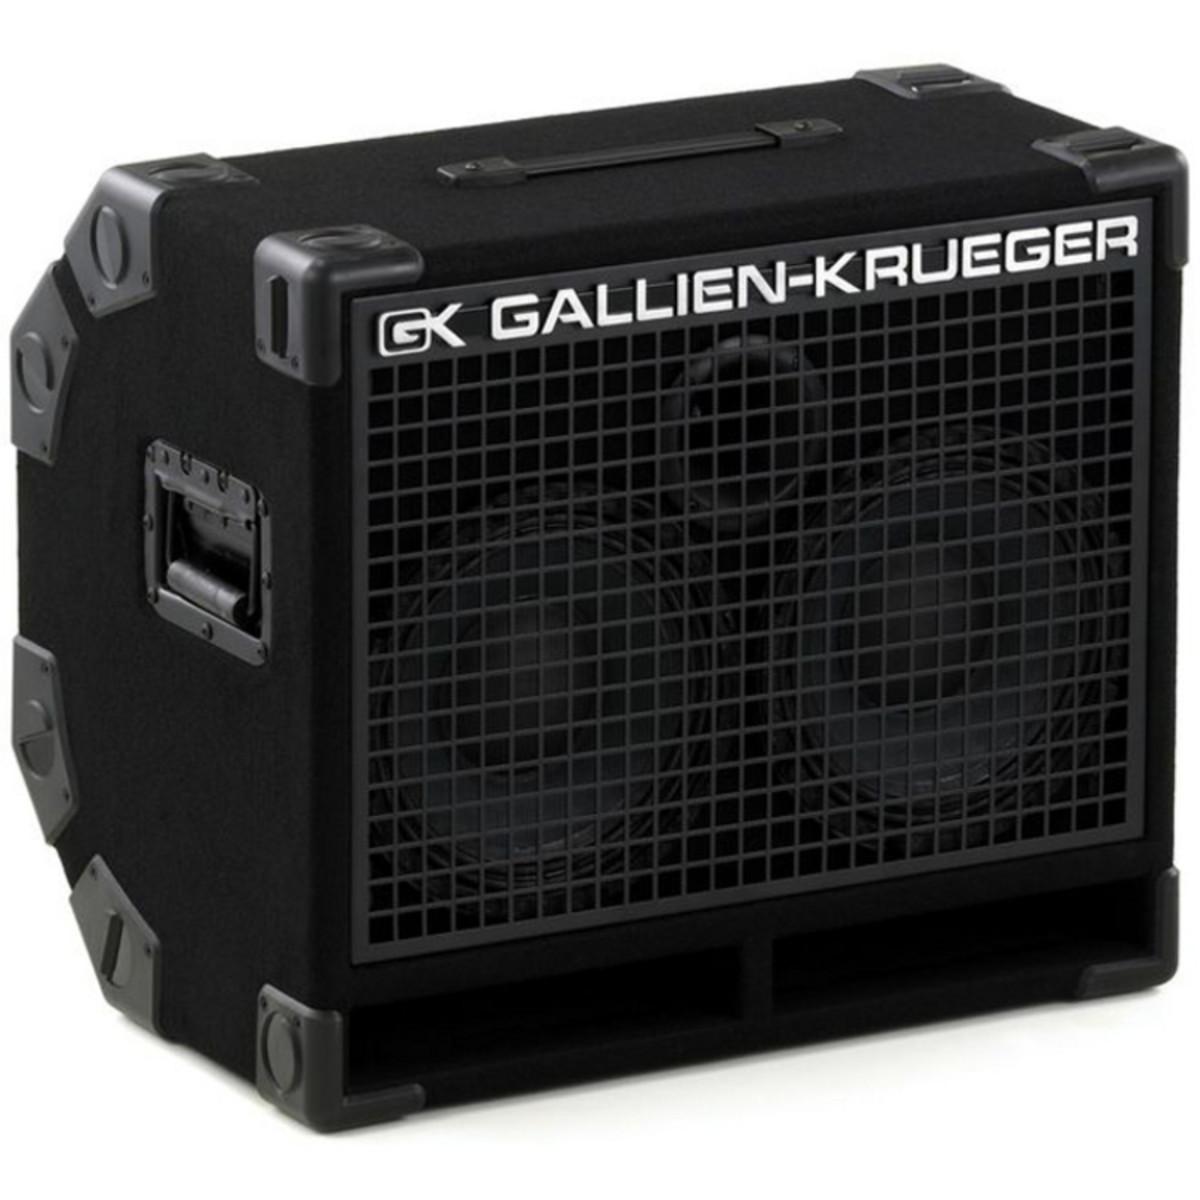 DISC Gallien Krueger 210RBH 8ohm 400w Bass Cab at Gear4music.com